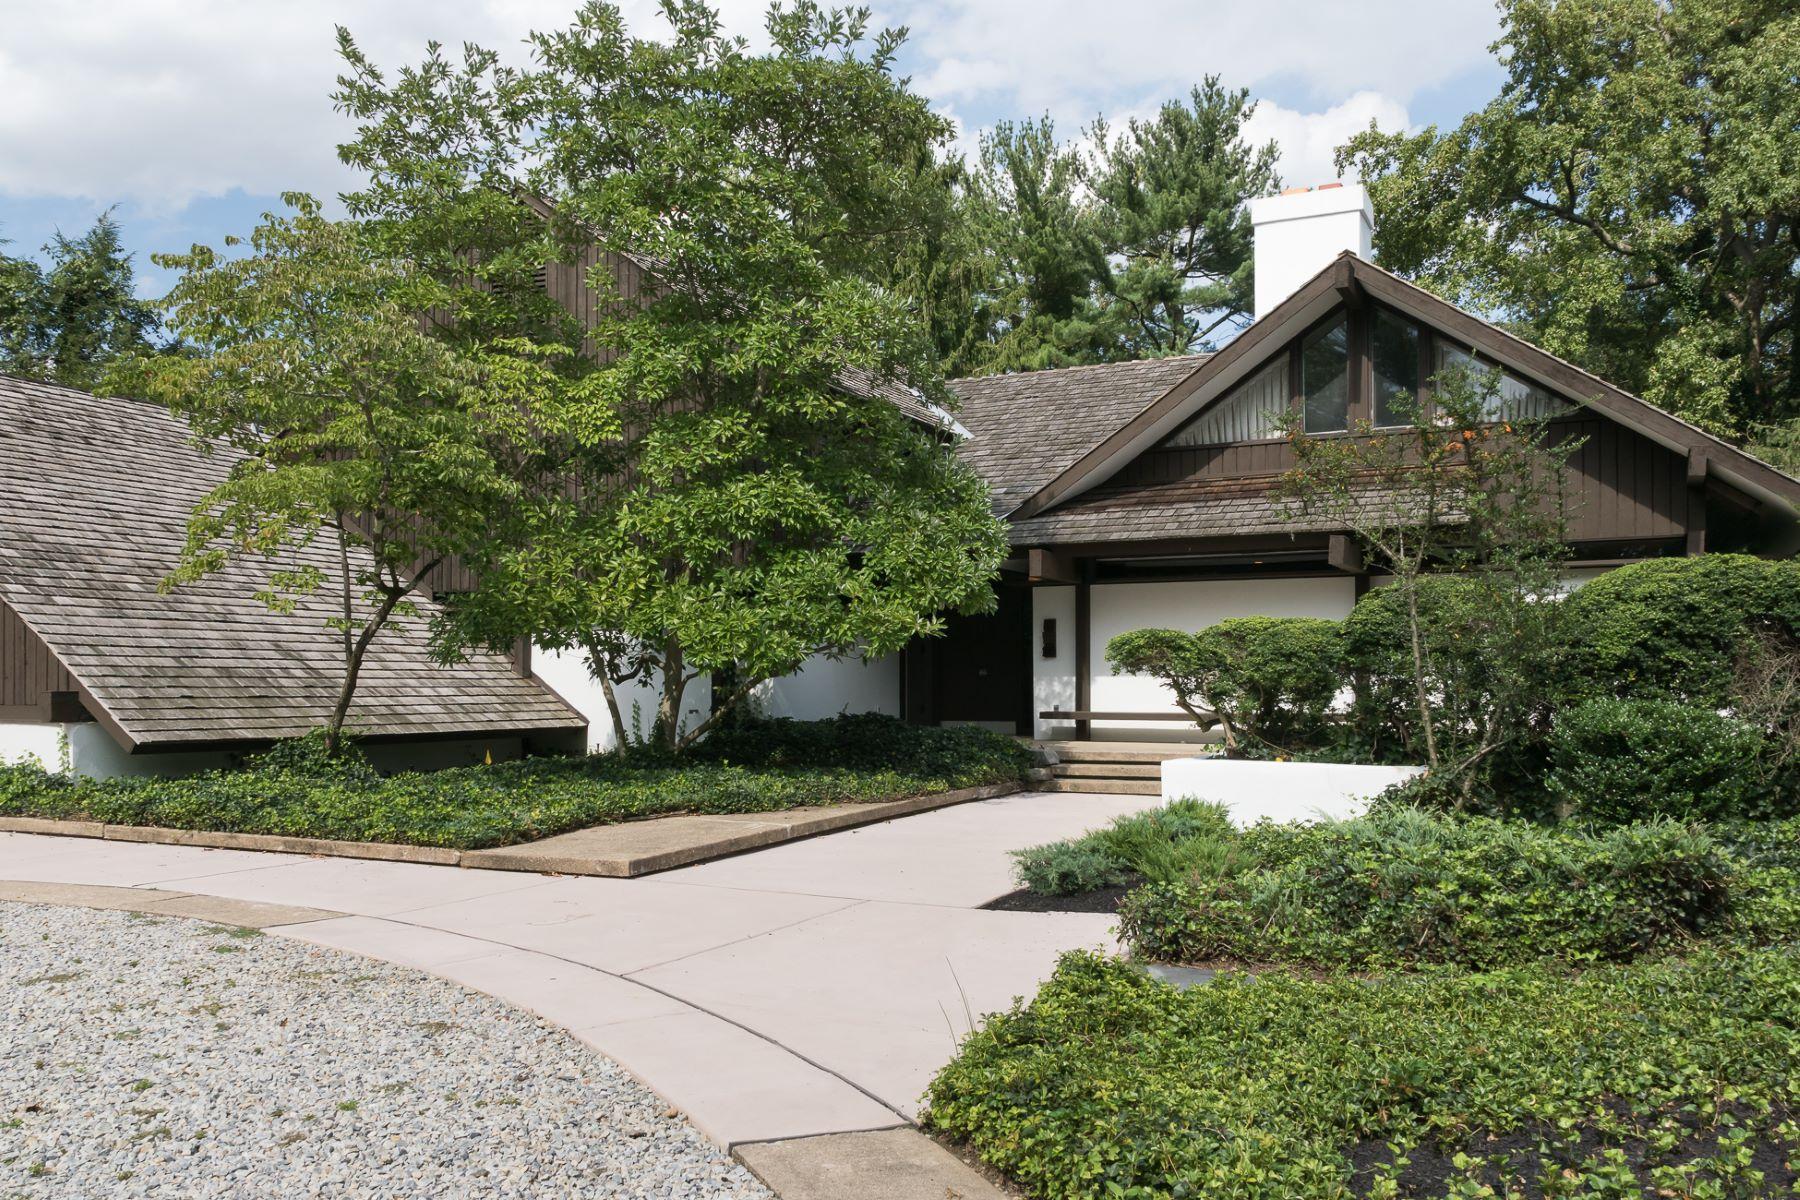 Single Family Homes için Satış at Mid-Century Modern Designed by Malcolm Wells 845 Golf View Road, Moorestown, New Jersey 08057 Amerika Birleşik Devletleri